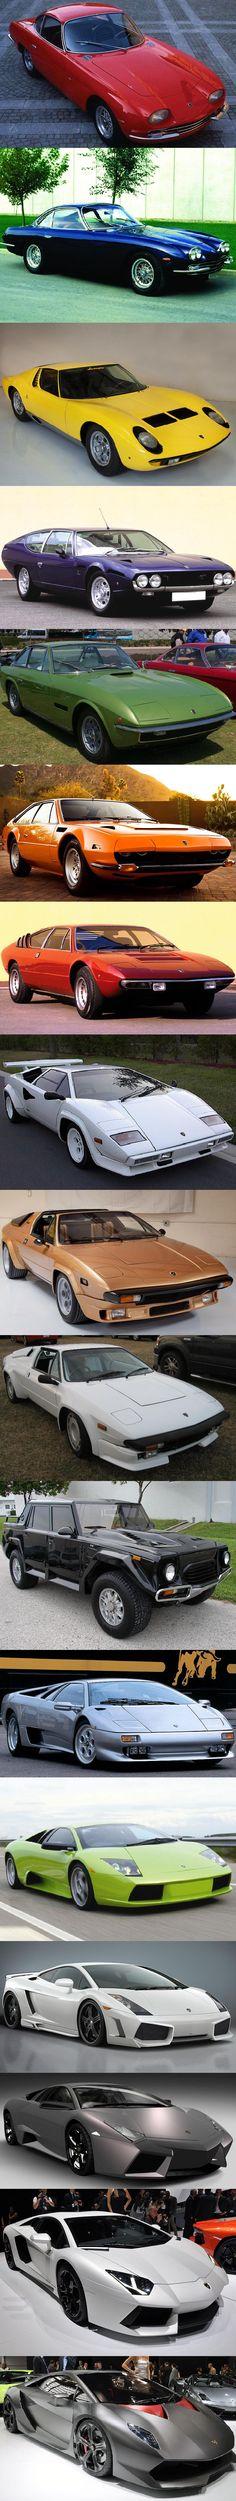 Chronology Of Lamborghini Prodution (not including concept vehicles) From Top to Bottom:   350 GT;  400 GT 2+2;  Miura;  Espada;  Islero;  Jarama;  Urraco;  Countach;  Silhouette;  Jalpa;  LM002;  Diablo;  Murciélago;  Gallardo;  Reventón;  Aventador;  Sesto Elemento.